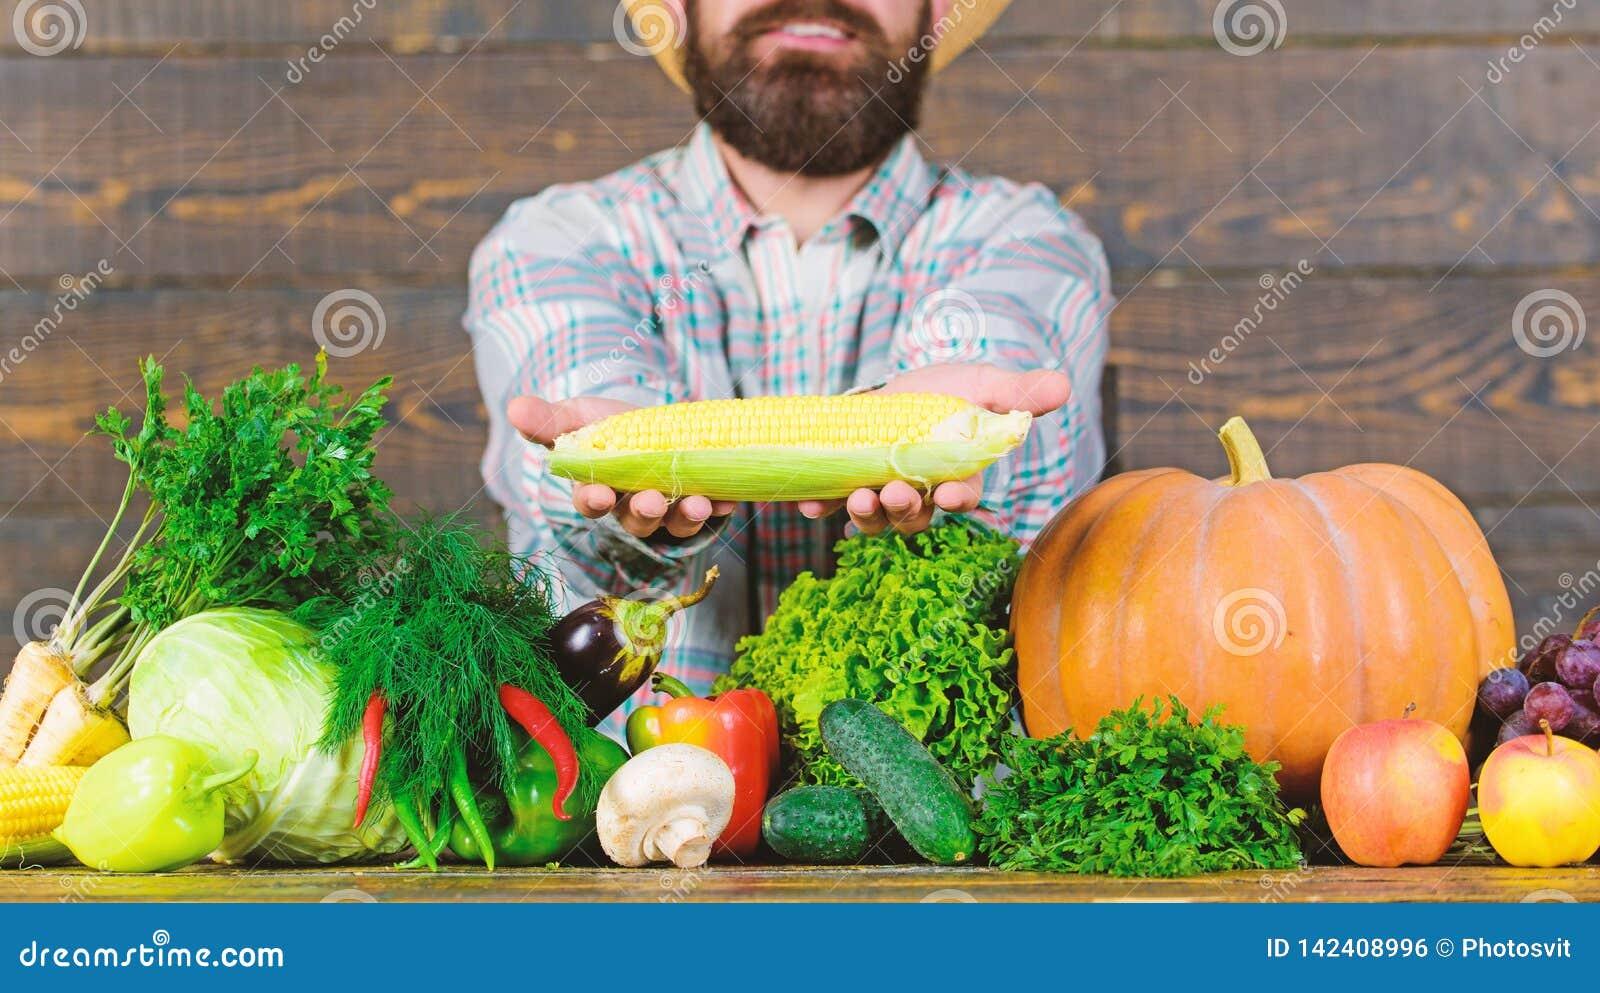 Farmer rustic villager appearance. Grow organic crops. Farmer straw hat presenting fresh vegetables. Man cheerful